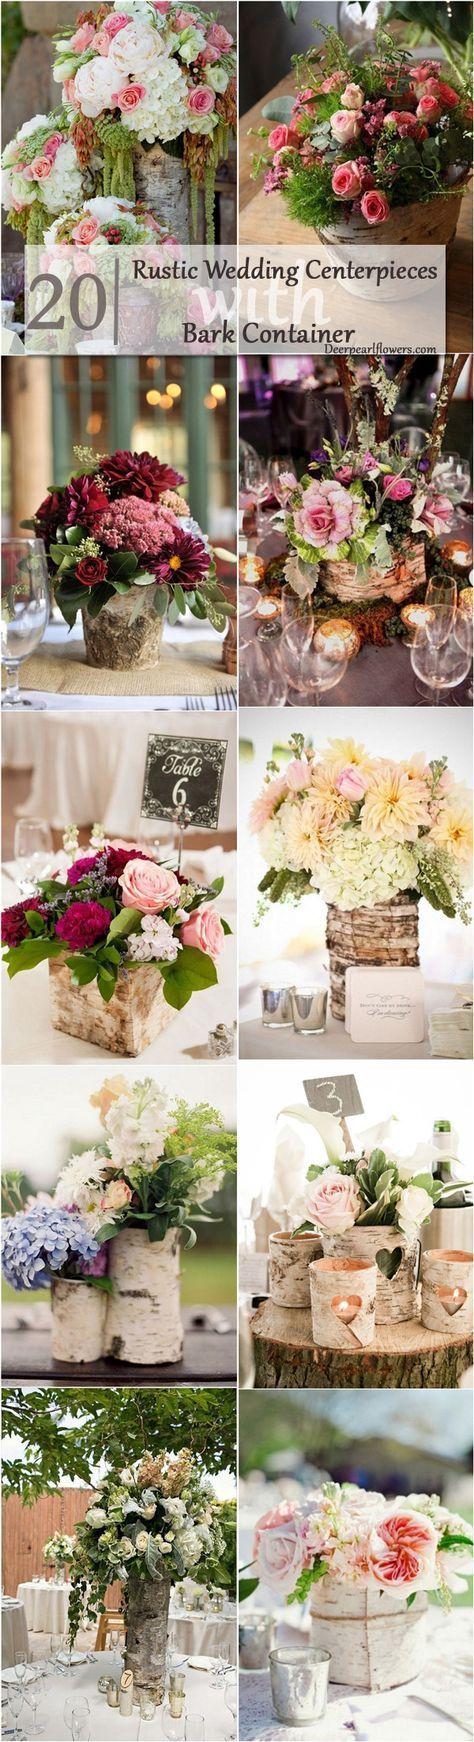 Best rustic wedding ideas images on pinterest